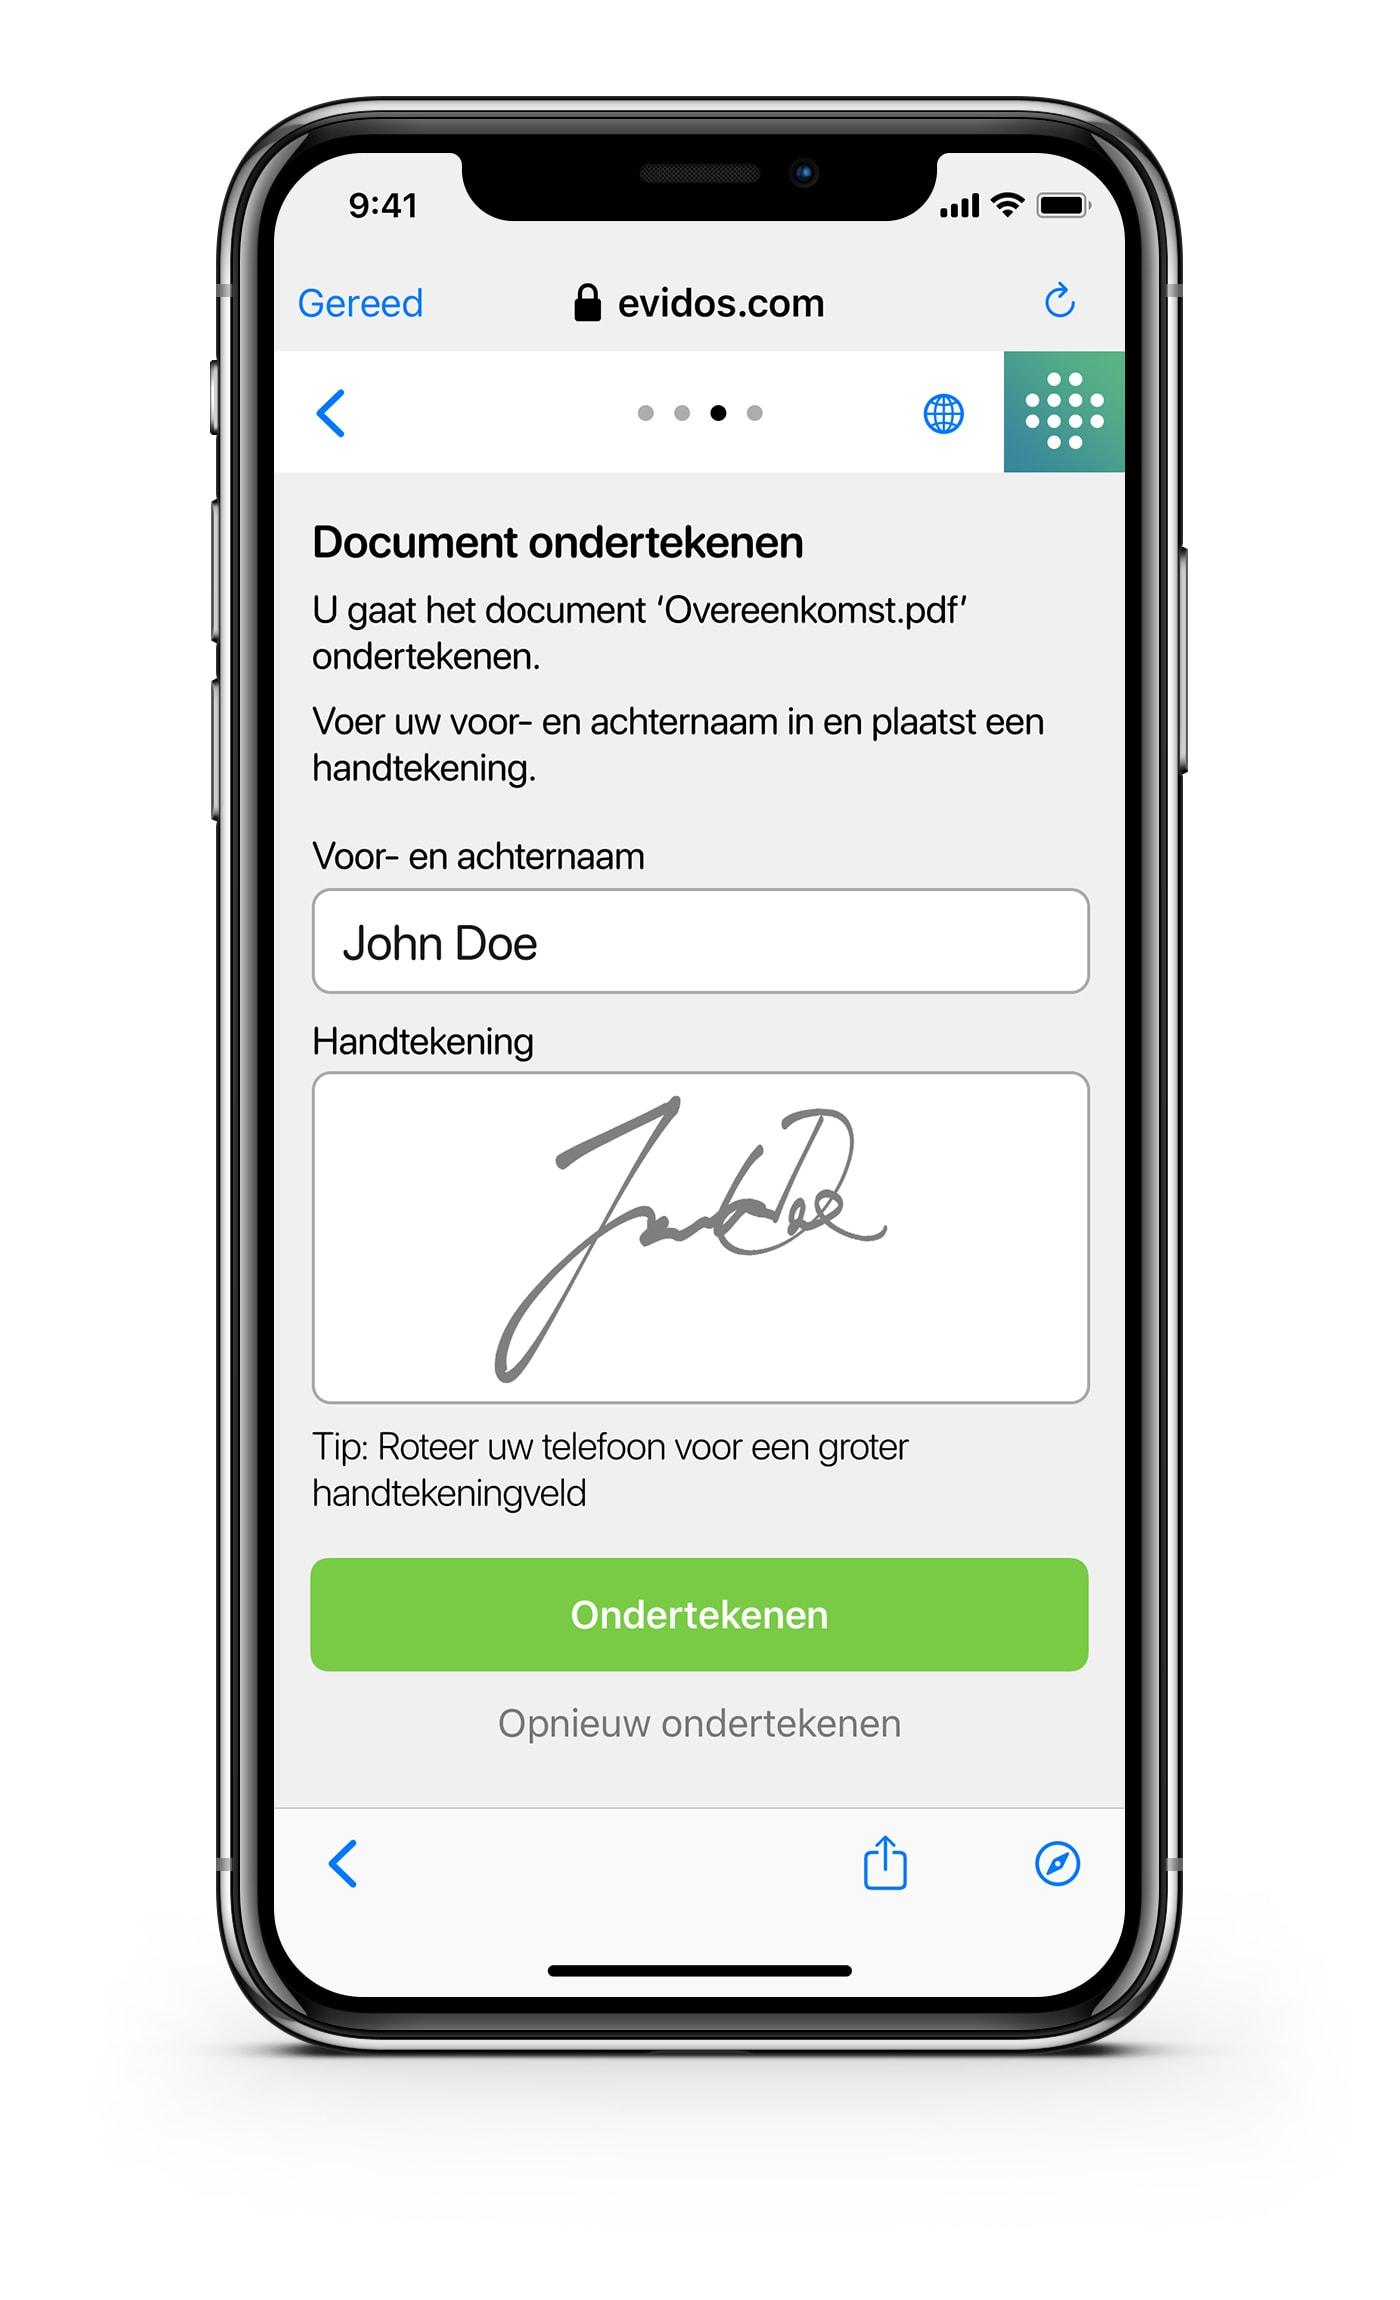 Ondertekenen - NL - stap 3